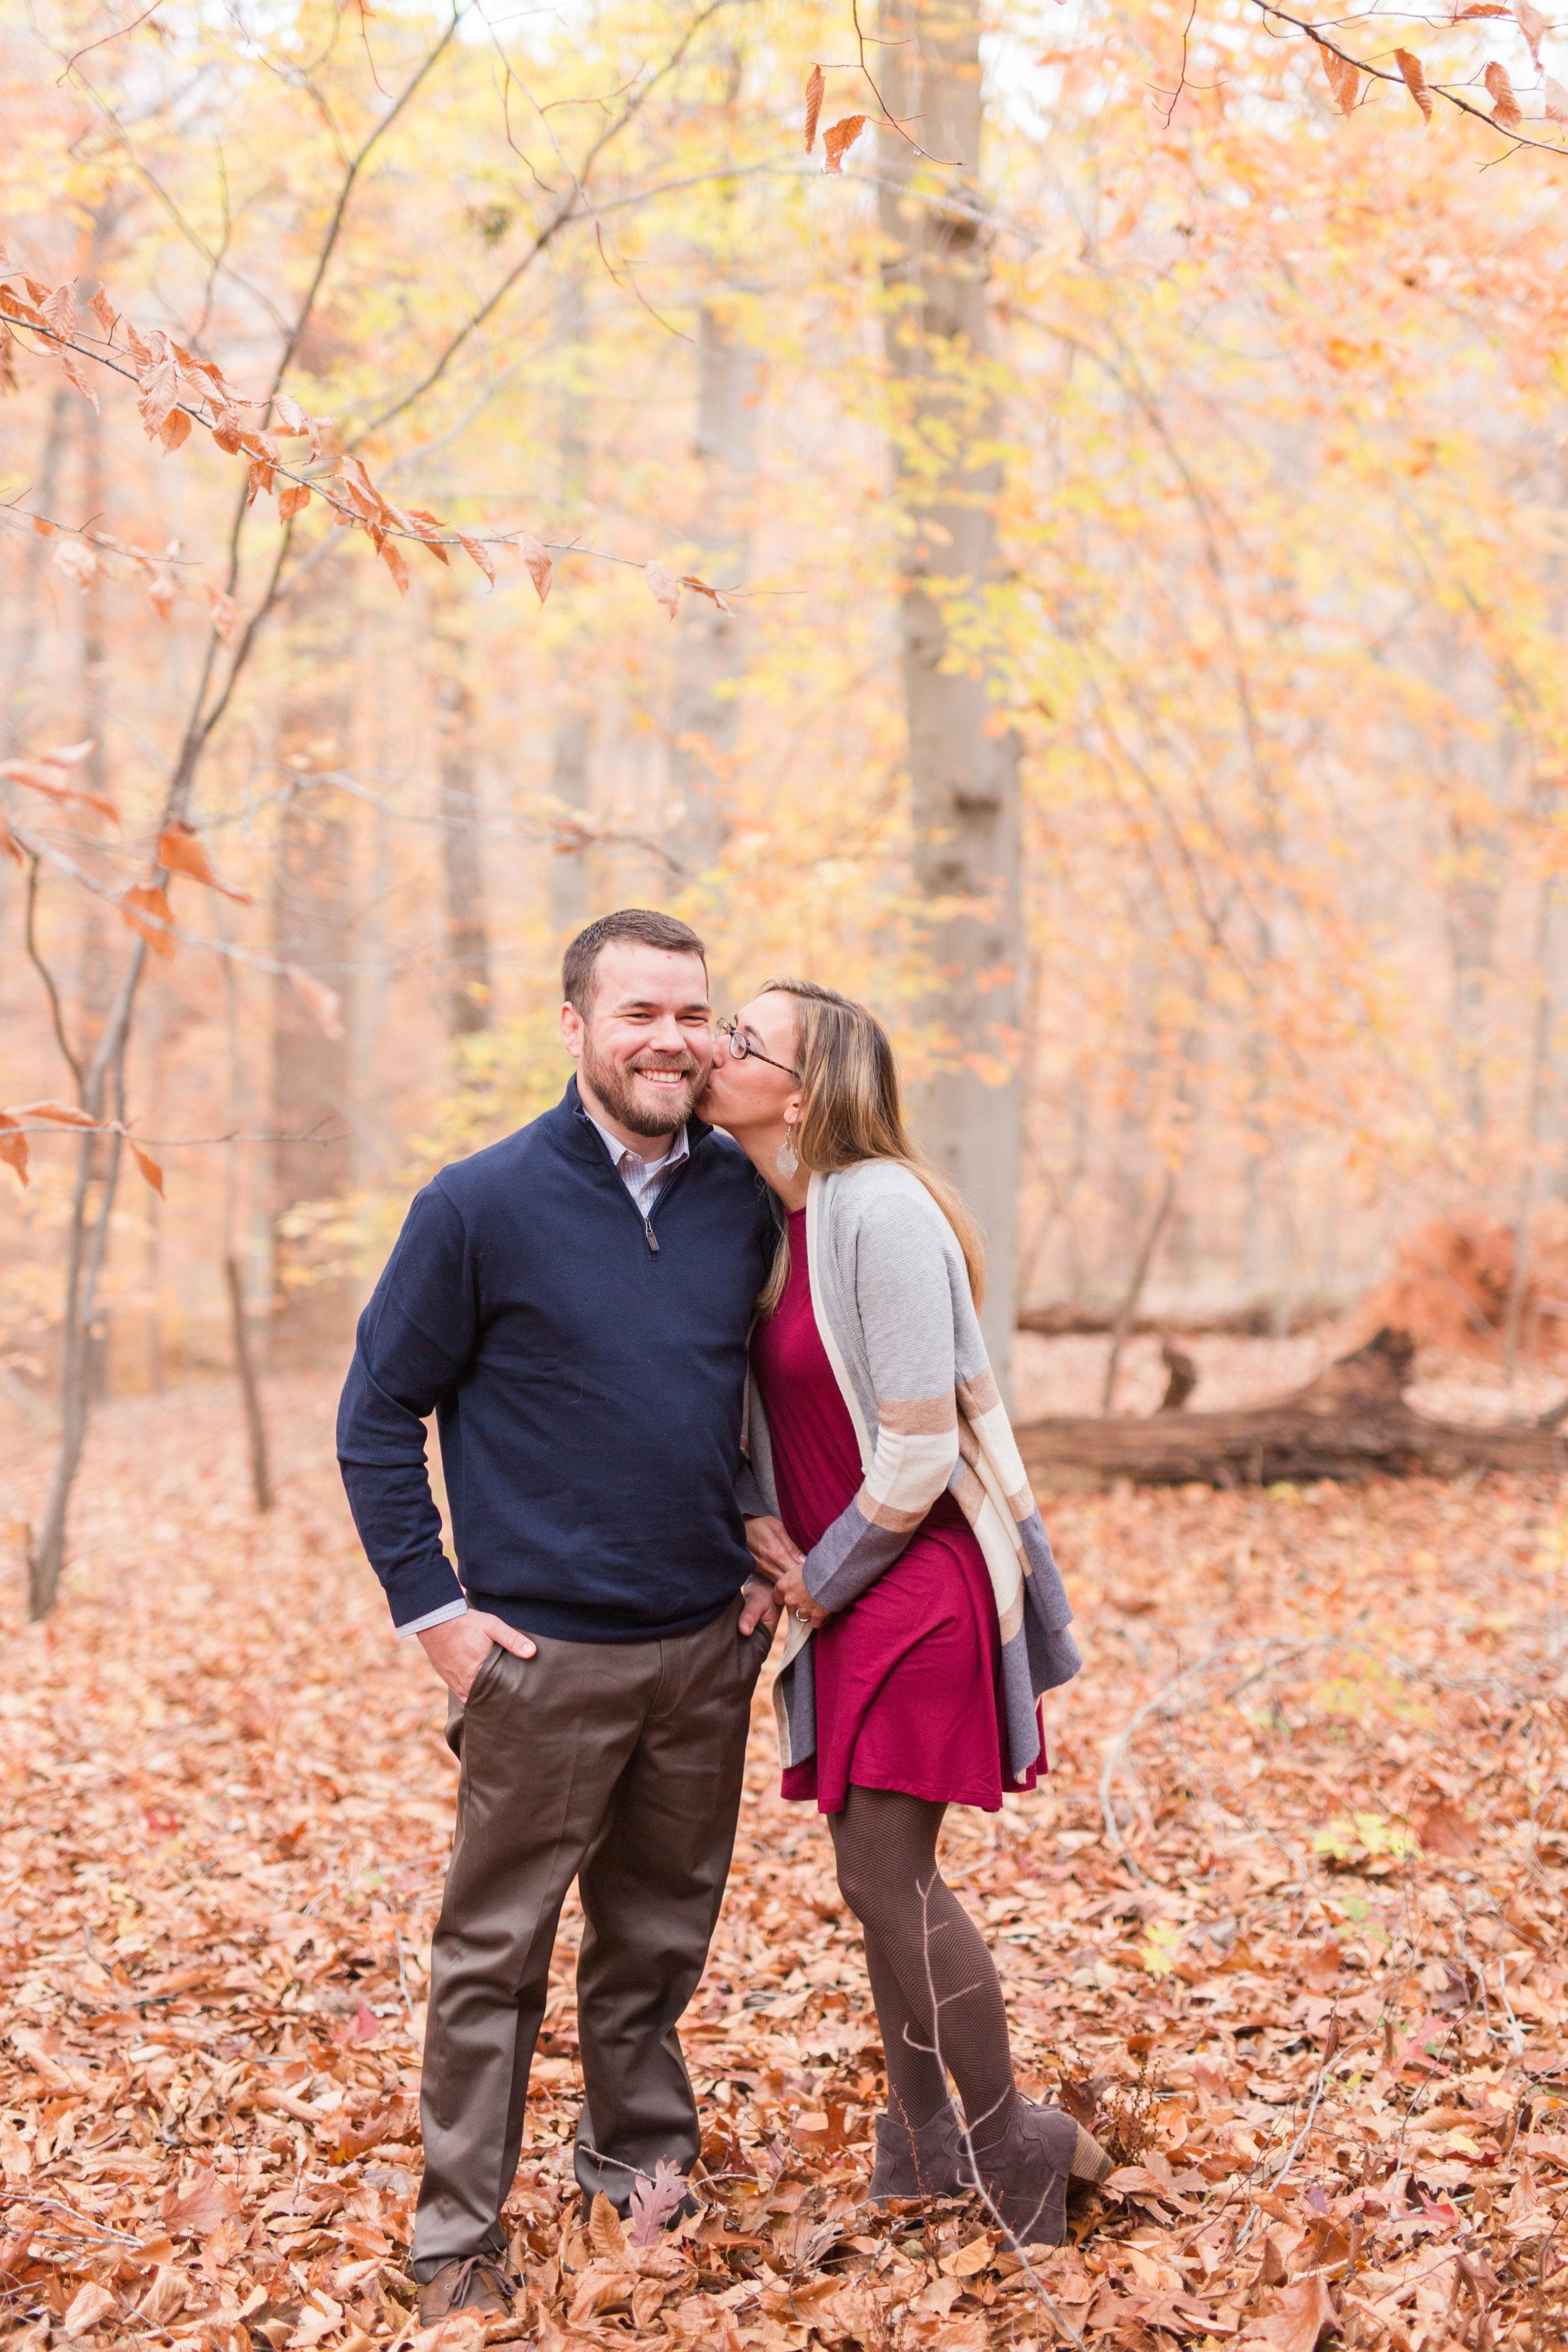 Lynchburg Virginia Engagement Session || Fall Engagement Photos in Virginia || Lynchburg Wedding and Portrait Photographer || www.ashleyeiban.com